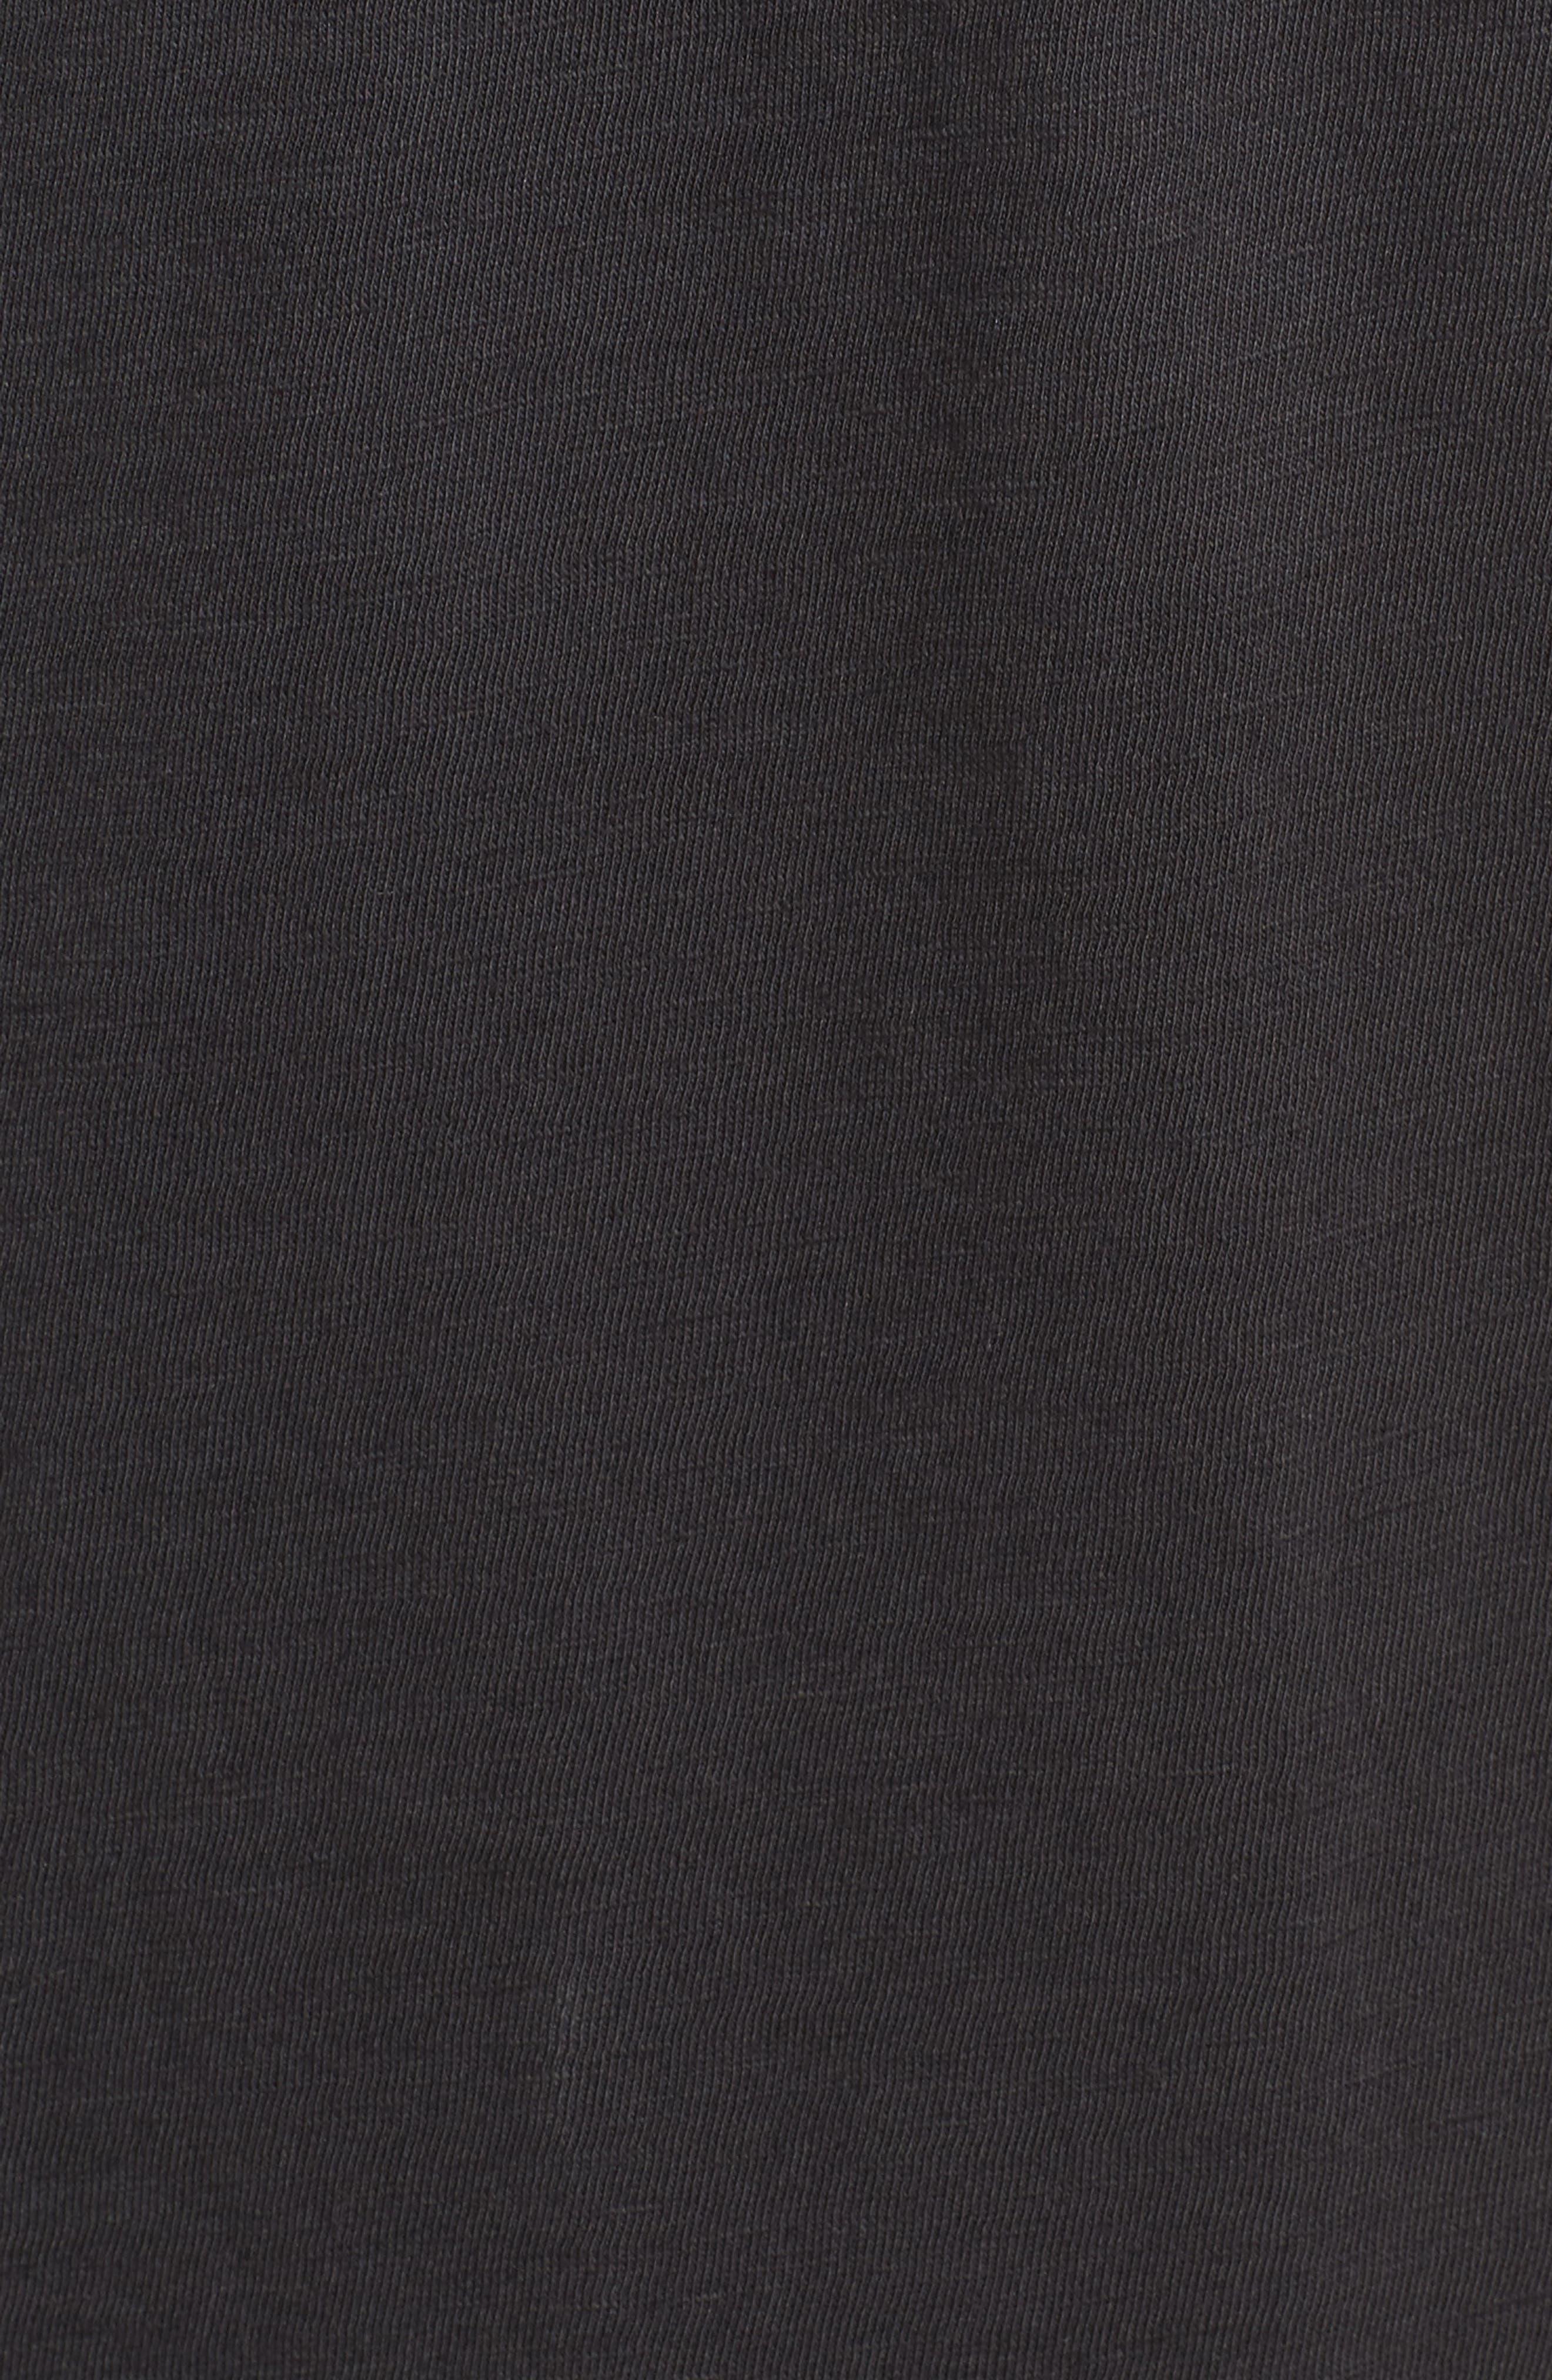 Sunset Eagle Pocket T-Shirt,                             Alternate thumbnail 5, color,                             V Black